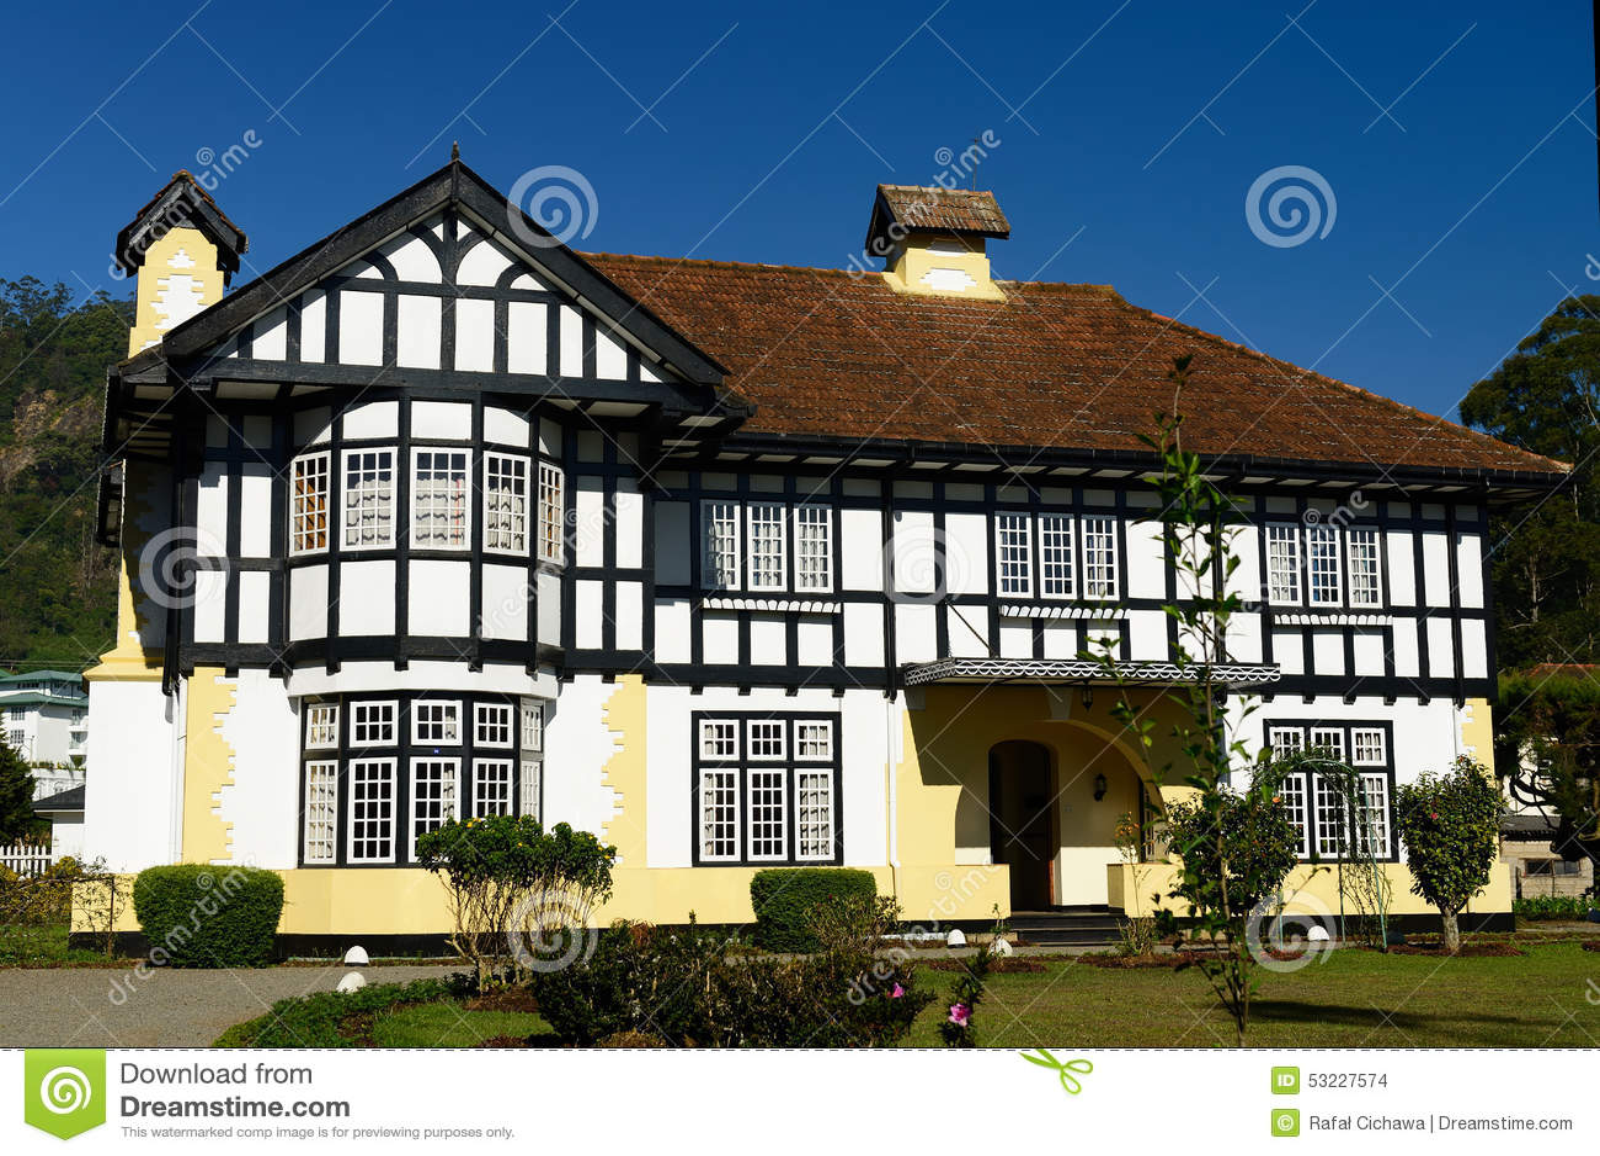 architecture de colonial de sri lanka photo stock image du britannique architecture 53227574. Black Bedroom Furniture Sets. Home Design Ideas